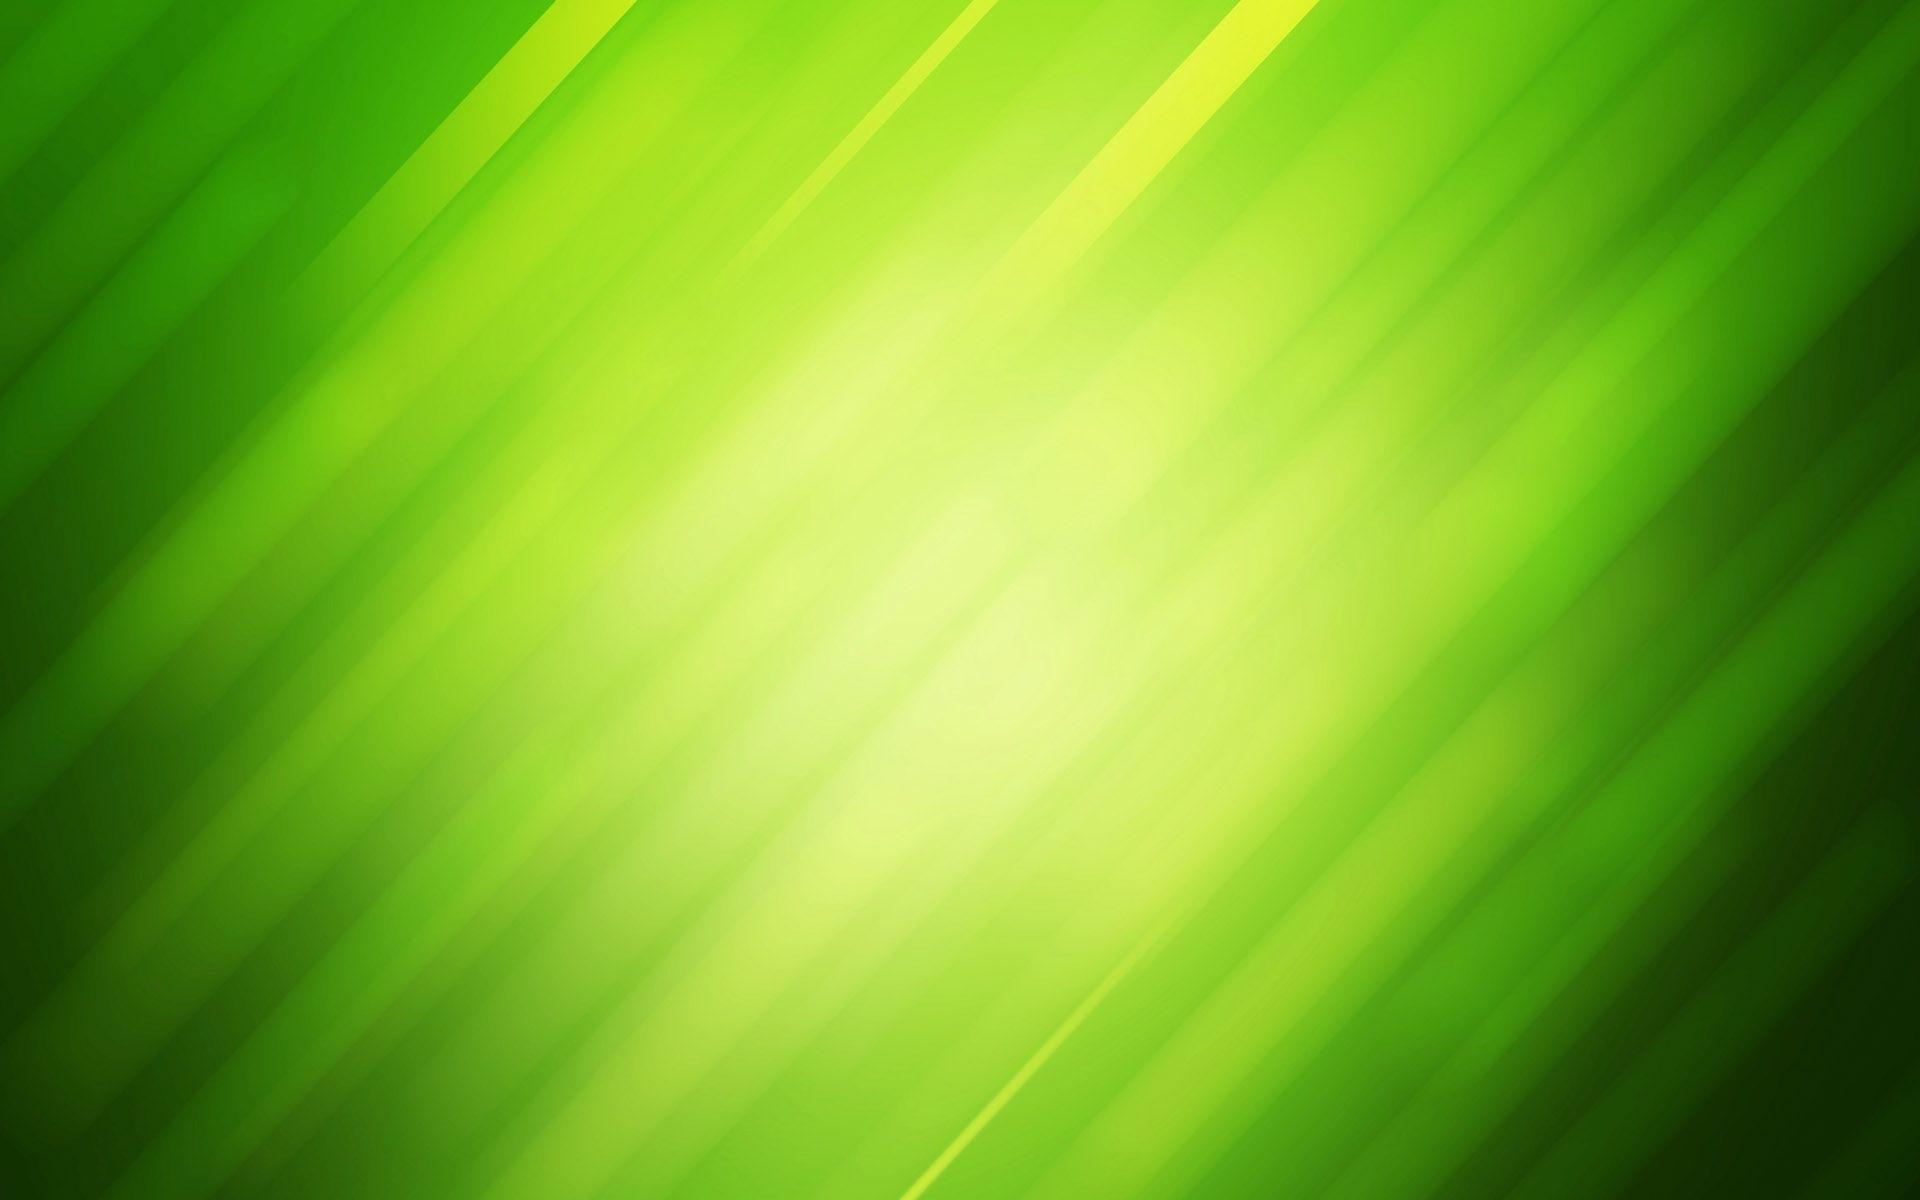 abstract green hd – background wallpaper | nature | pinterest | hd